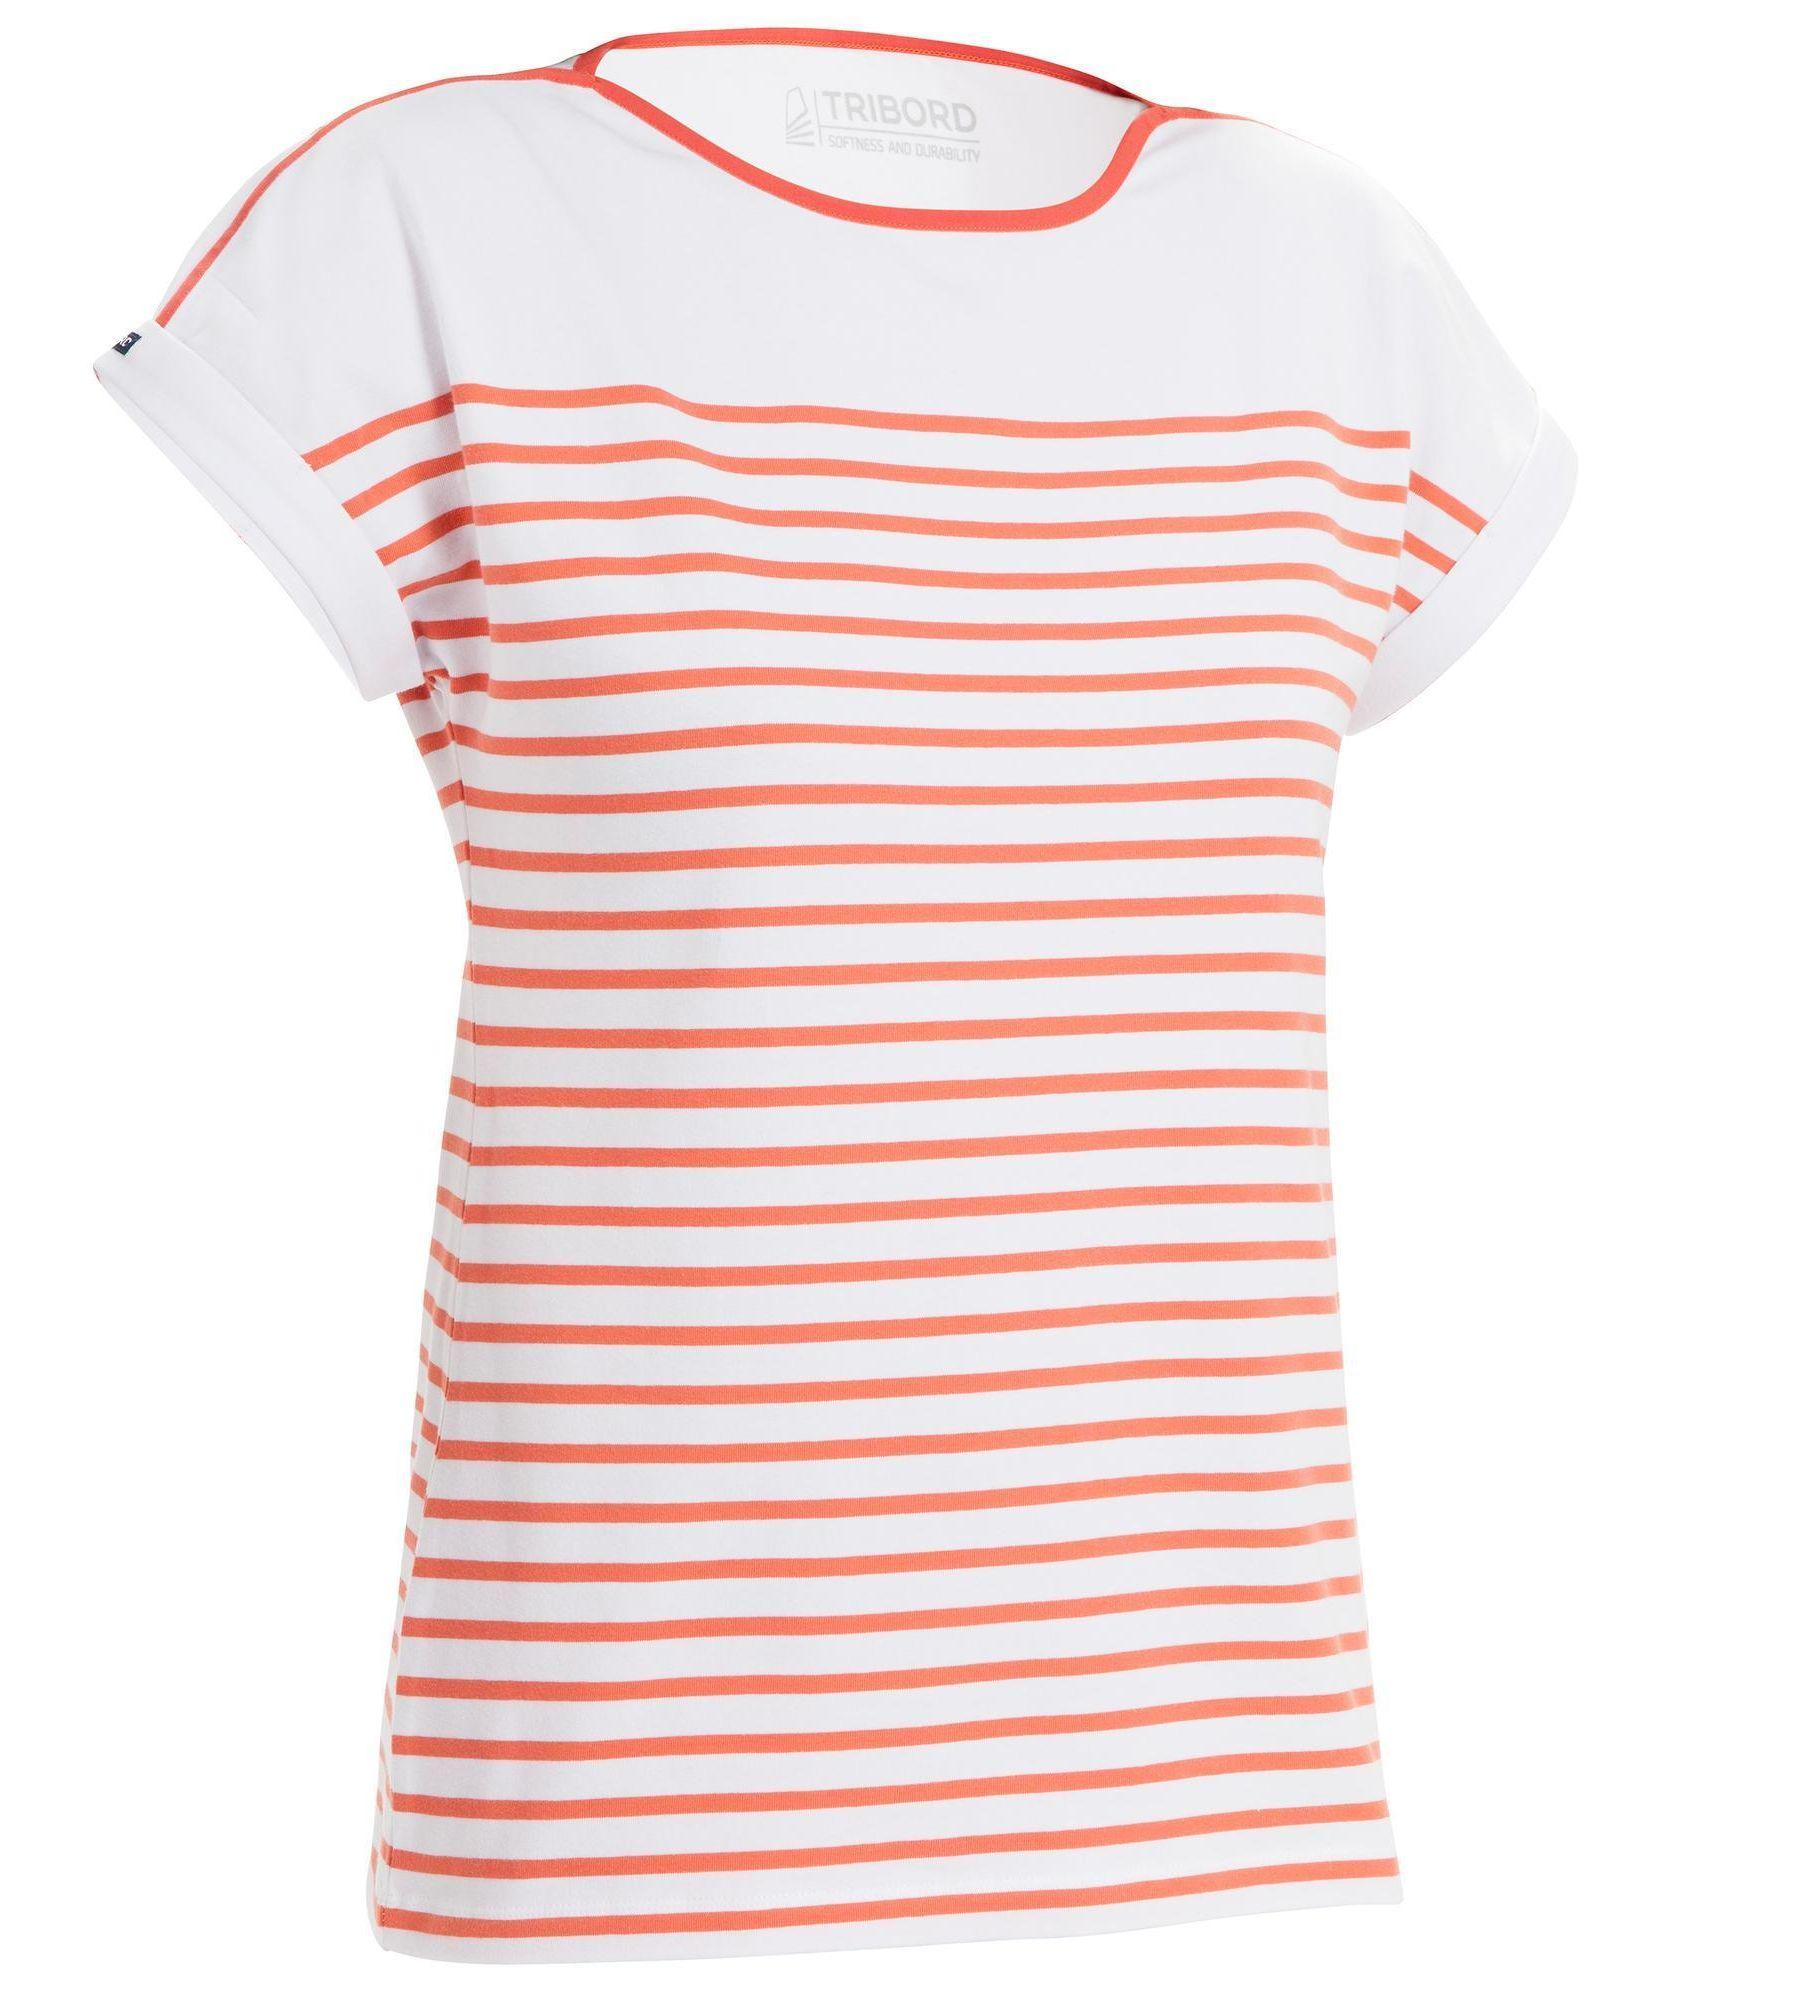 Koszulka żeglarska krótki rękaw SAILING 100 damska